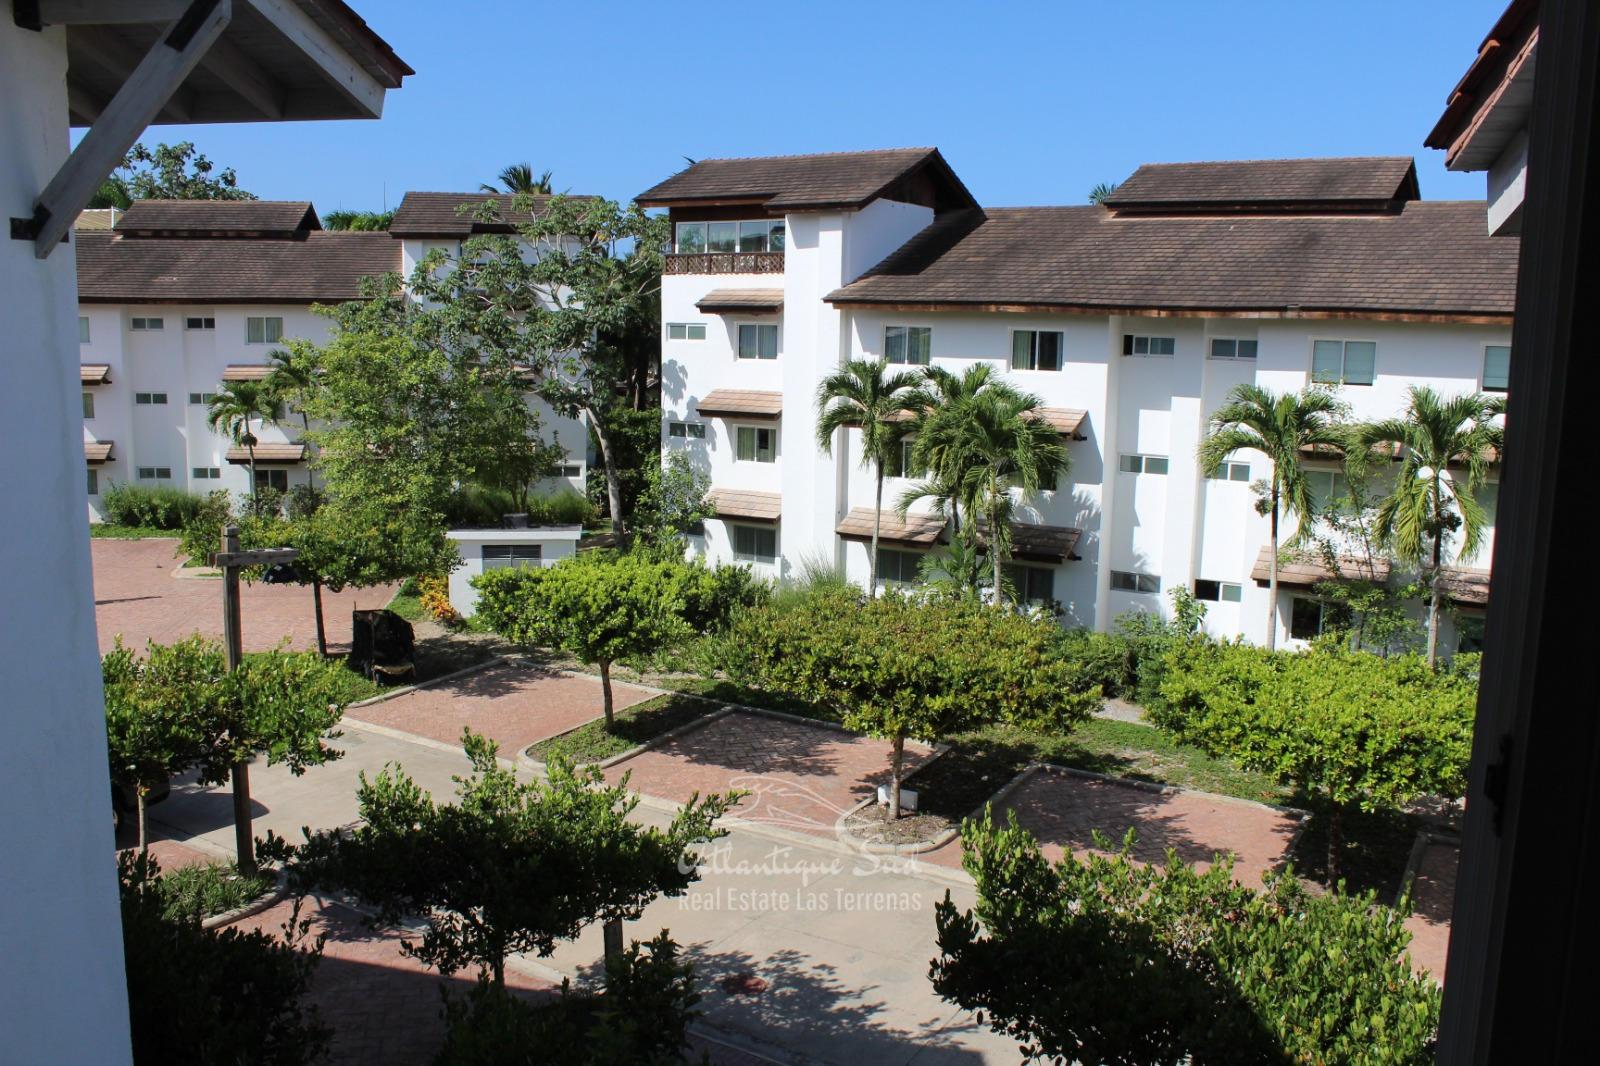 Apartments near the beach real estate las terrenas dominican republic43.jpg